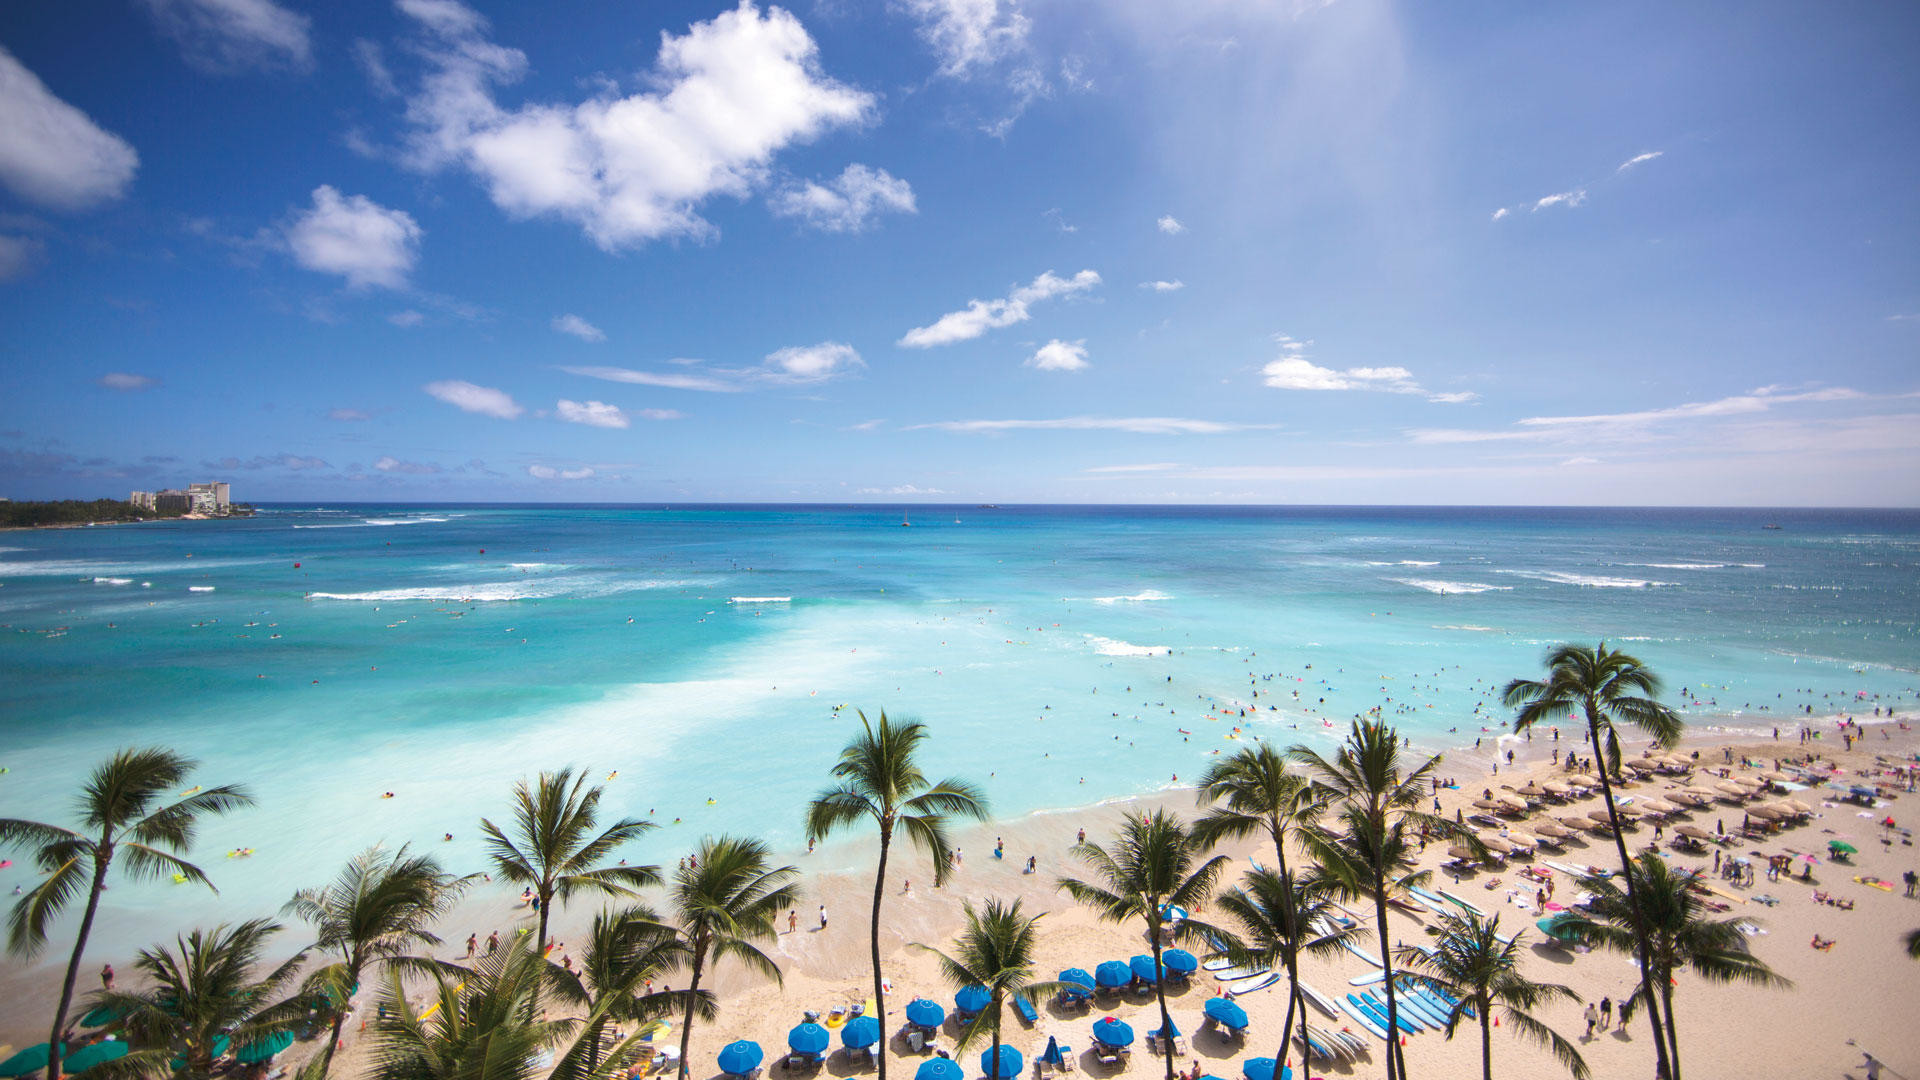 61 Waikiki Beach Wallpapers on WallpaperPlay 1920x1080